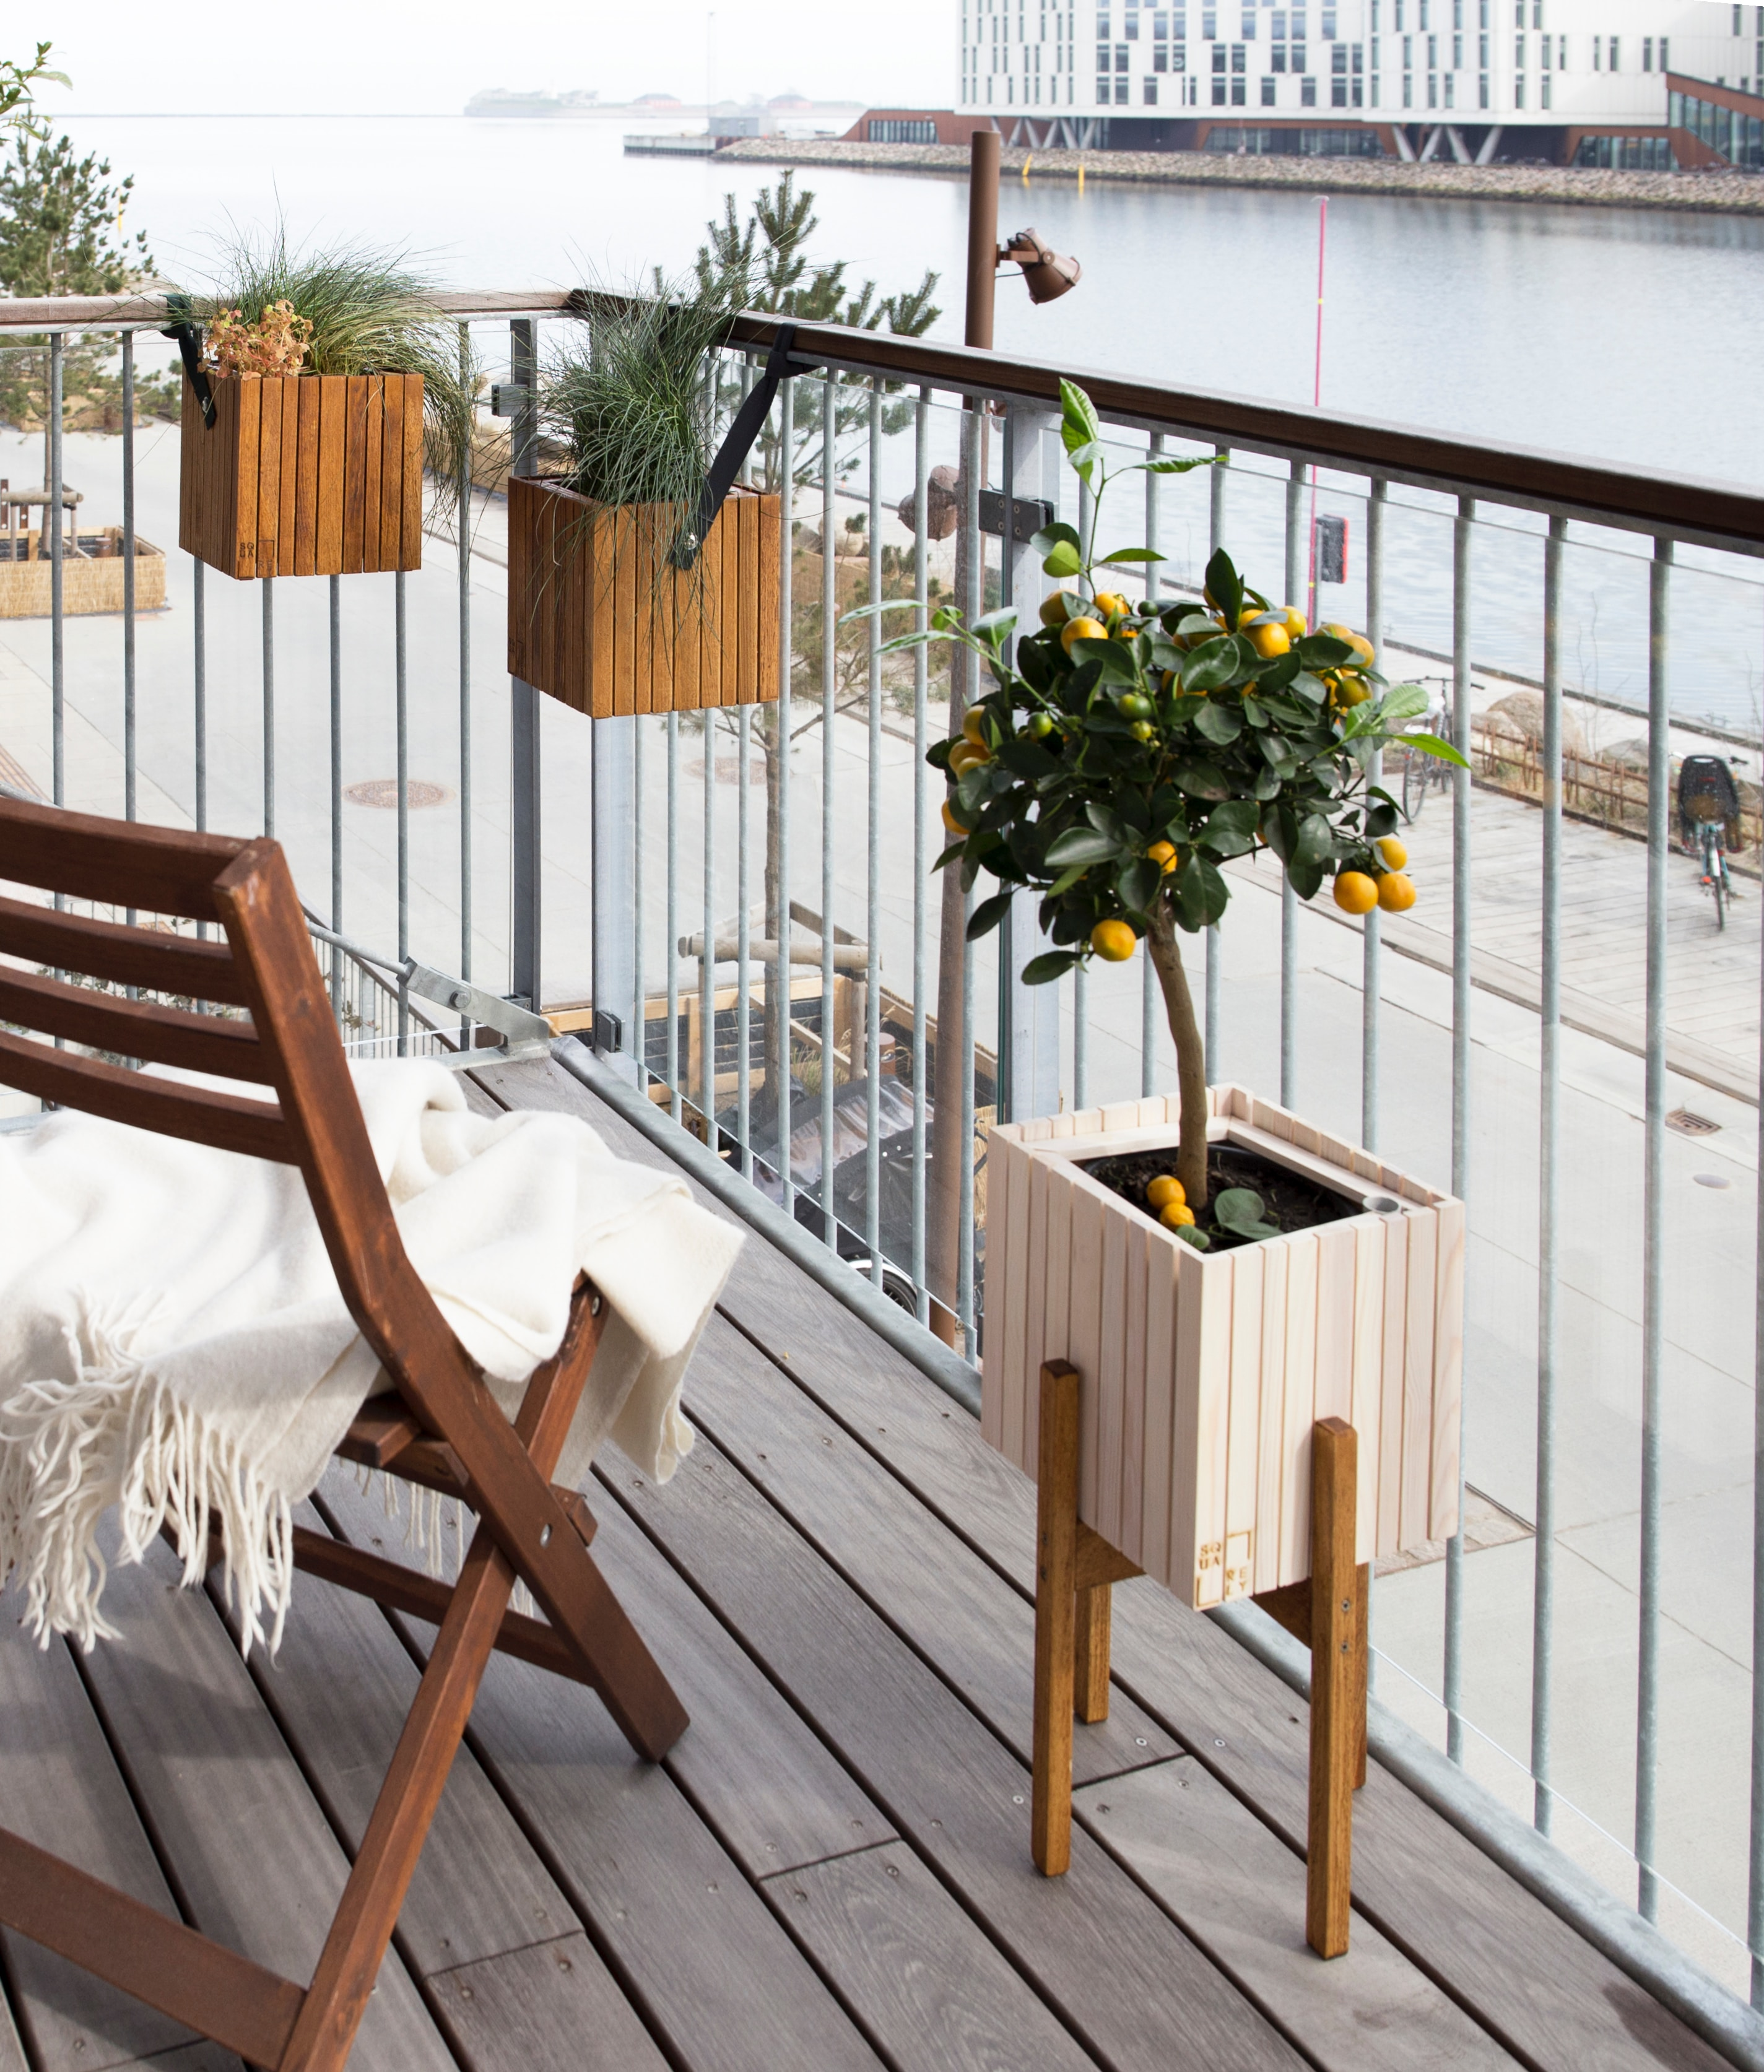 het perfecte balkon // balkon inrichten //gezellig balkon maken // romantisch balkon //balkon inspiratie zomer